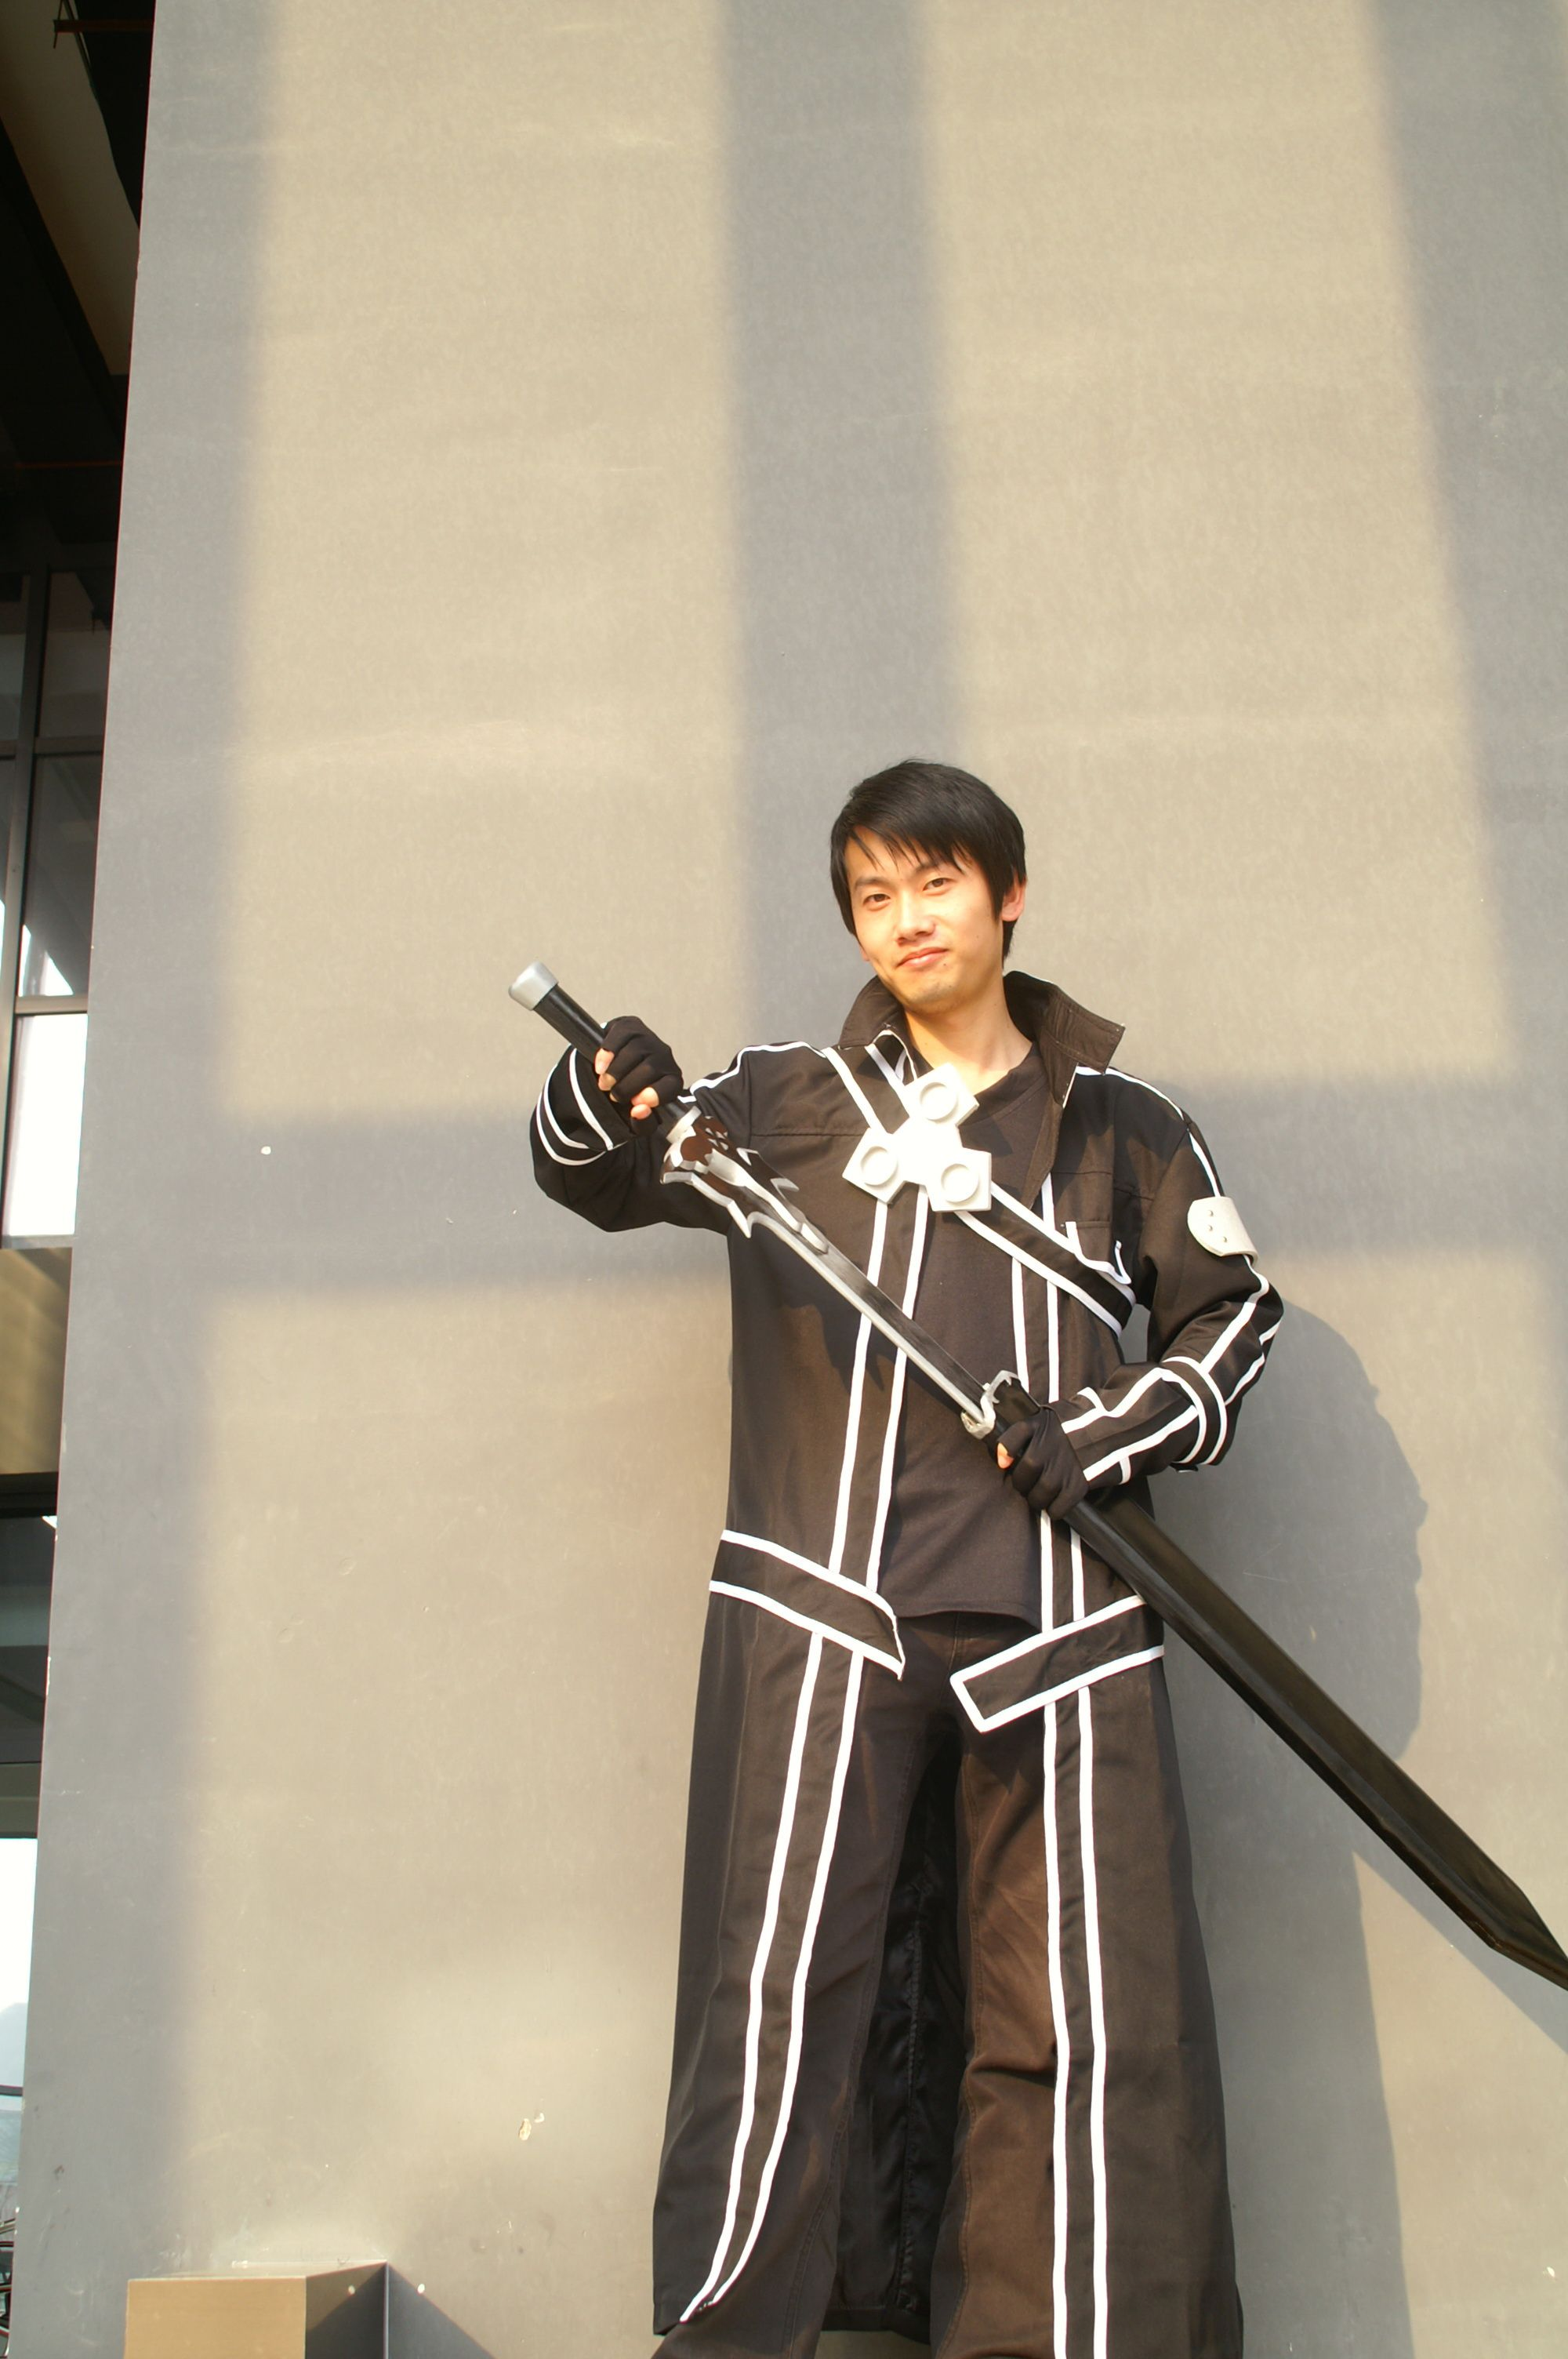 Sword Art Online Kirito Cosplay   FAIL cosplay   Pinterest ...